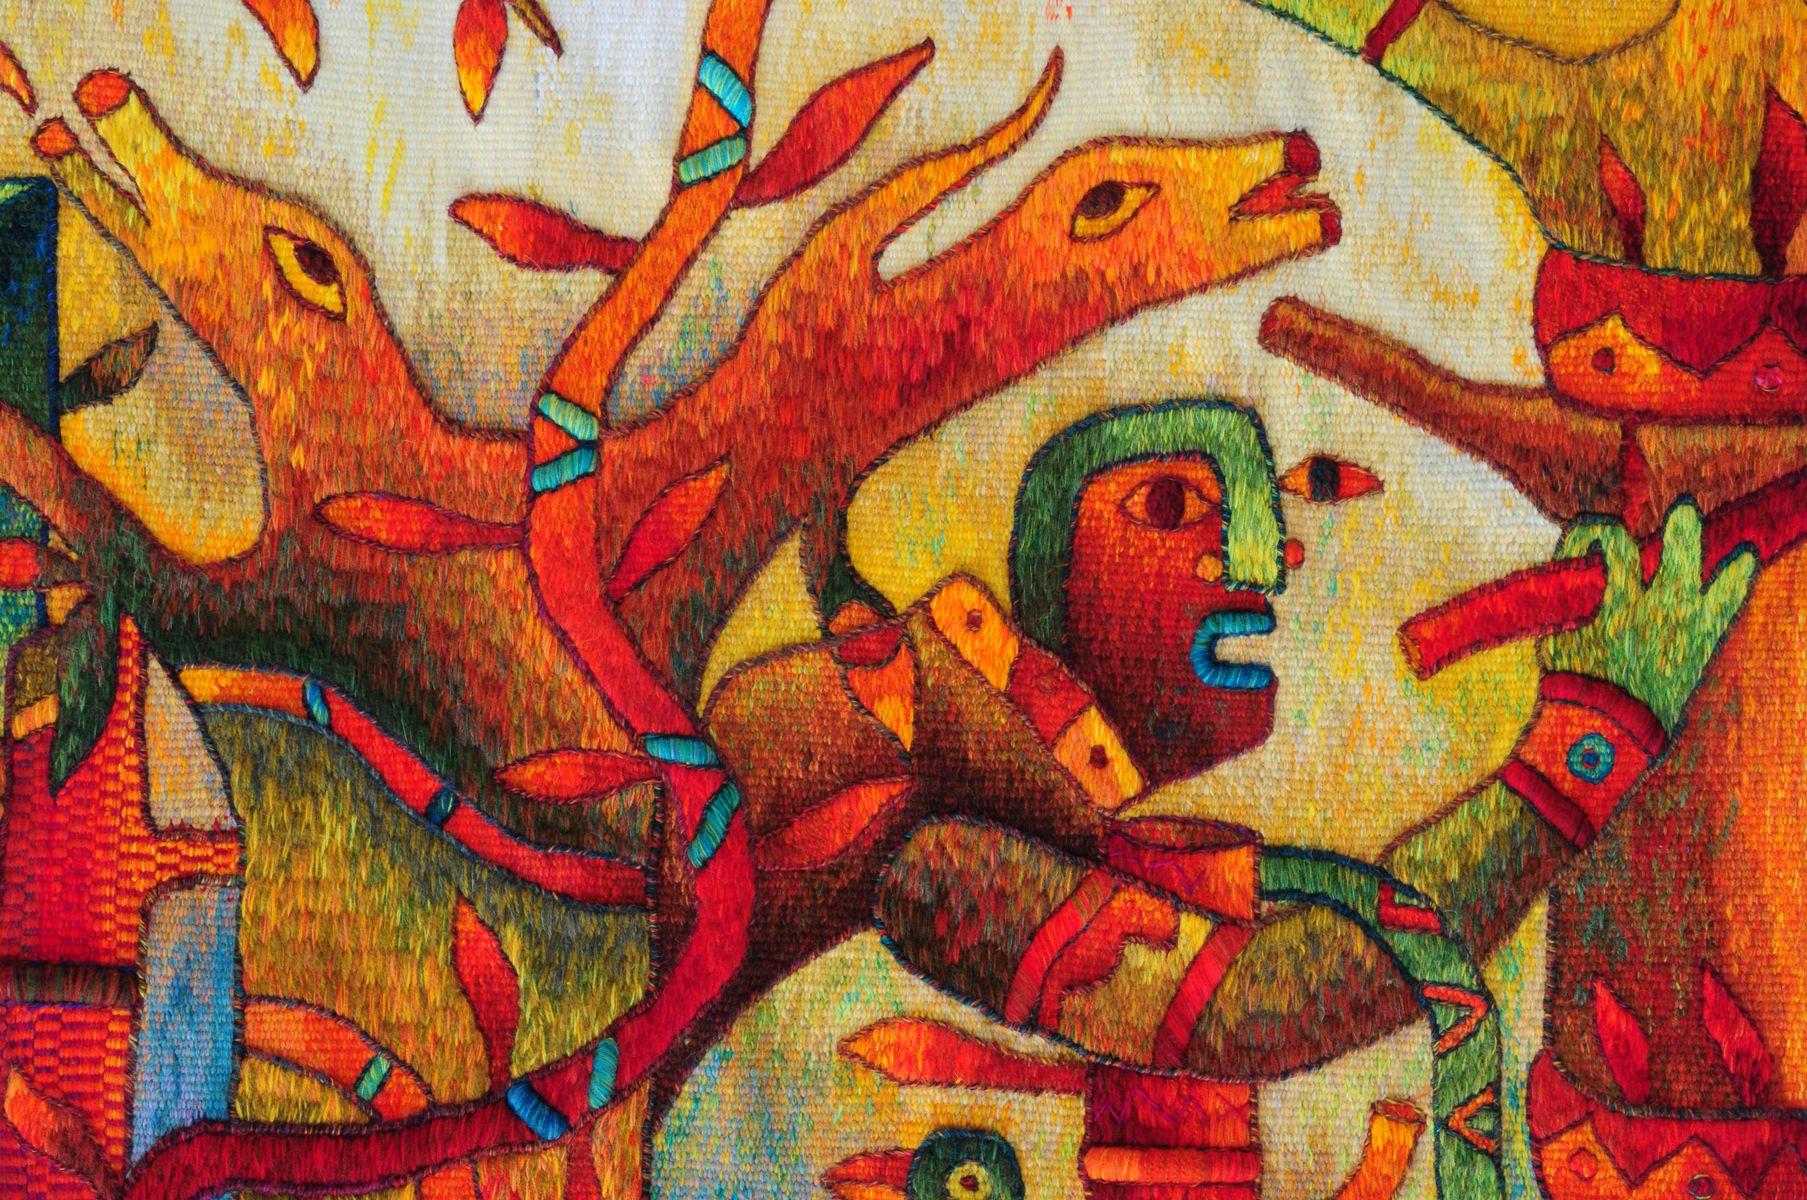 Mayor Spirit - Award Winning Tapestry by Maximo Laura - Tapestry Detail